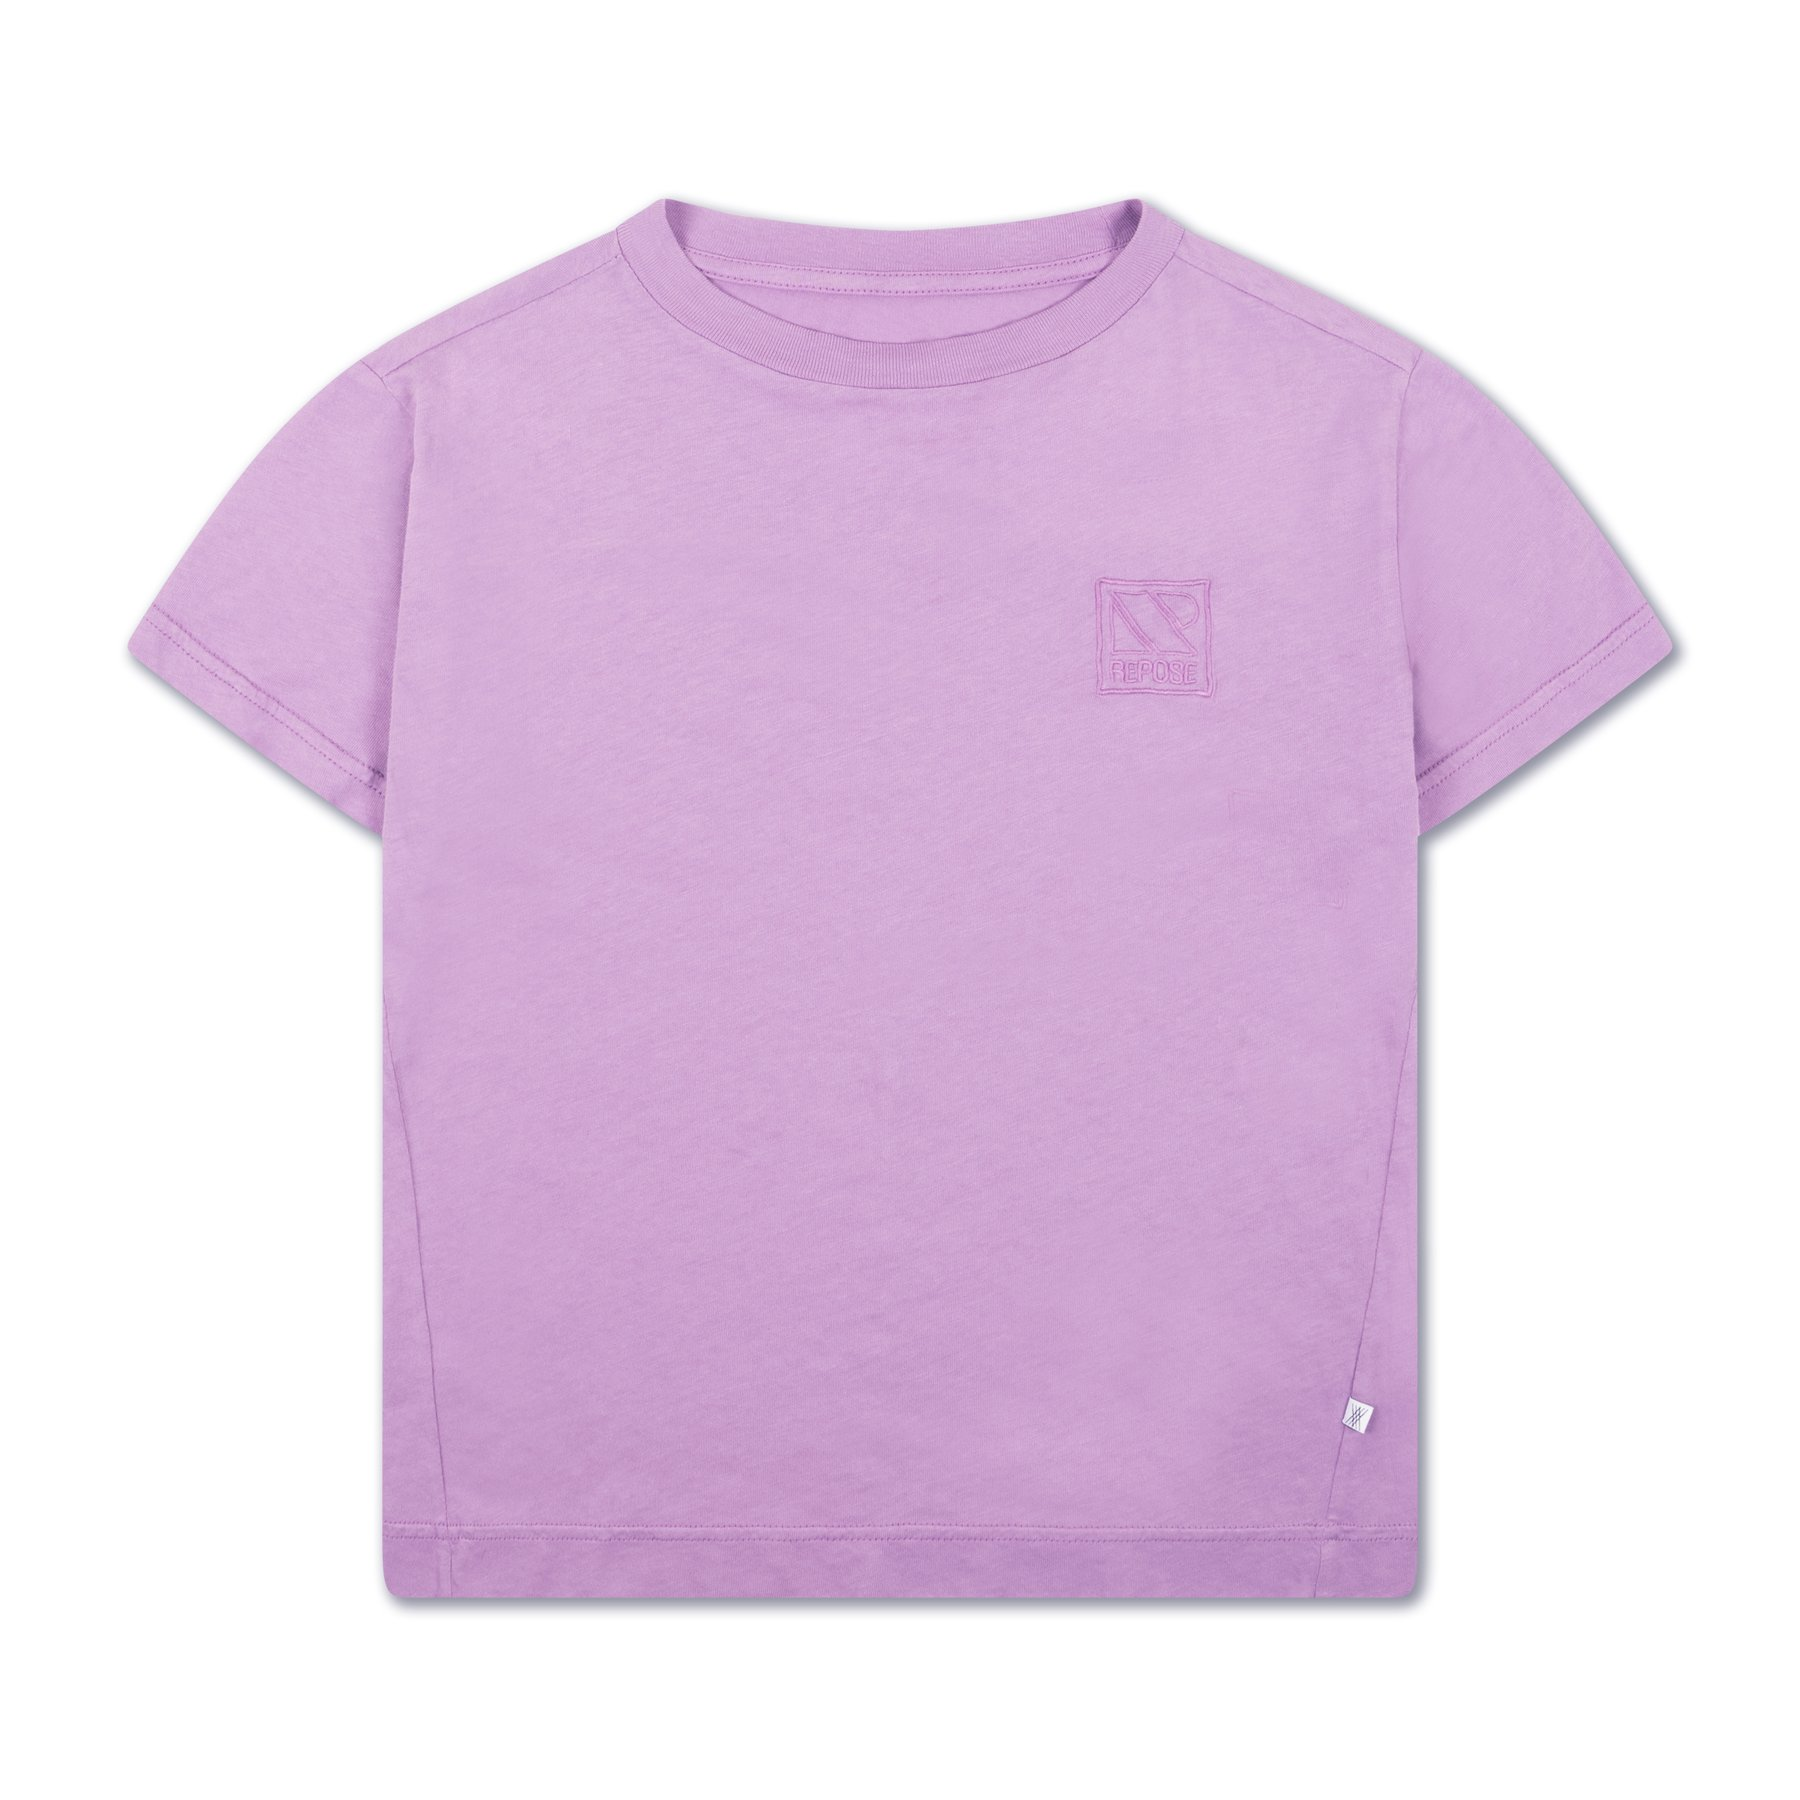 Repose AMS - T-Shirt Greyish Violet